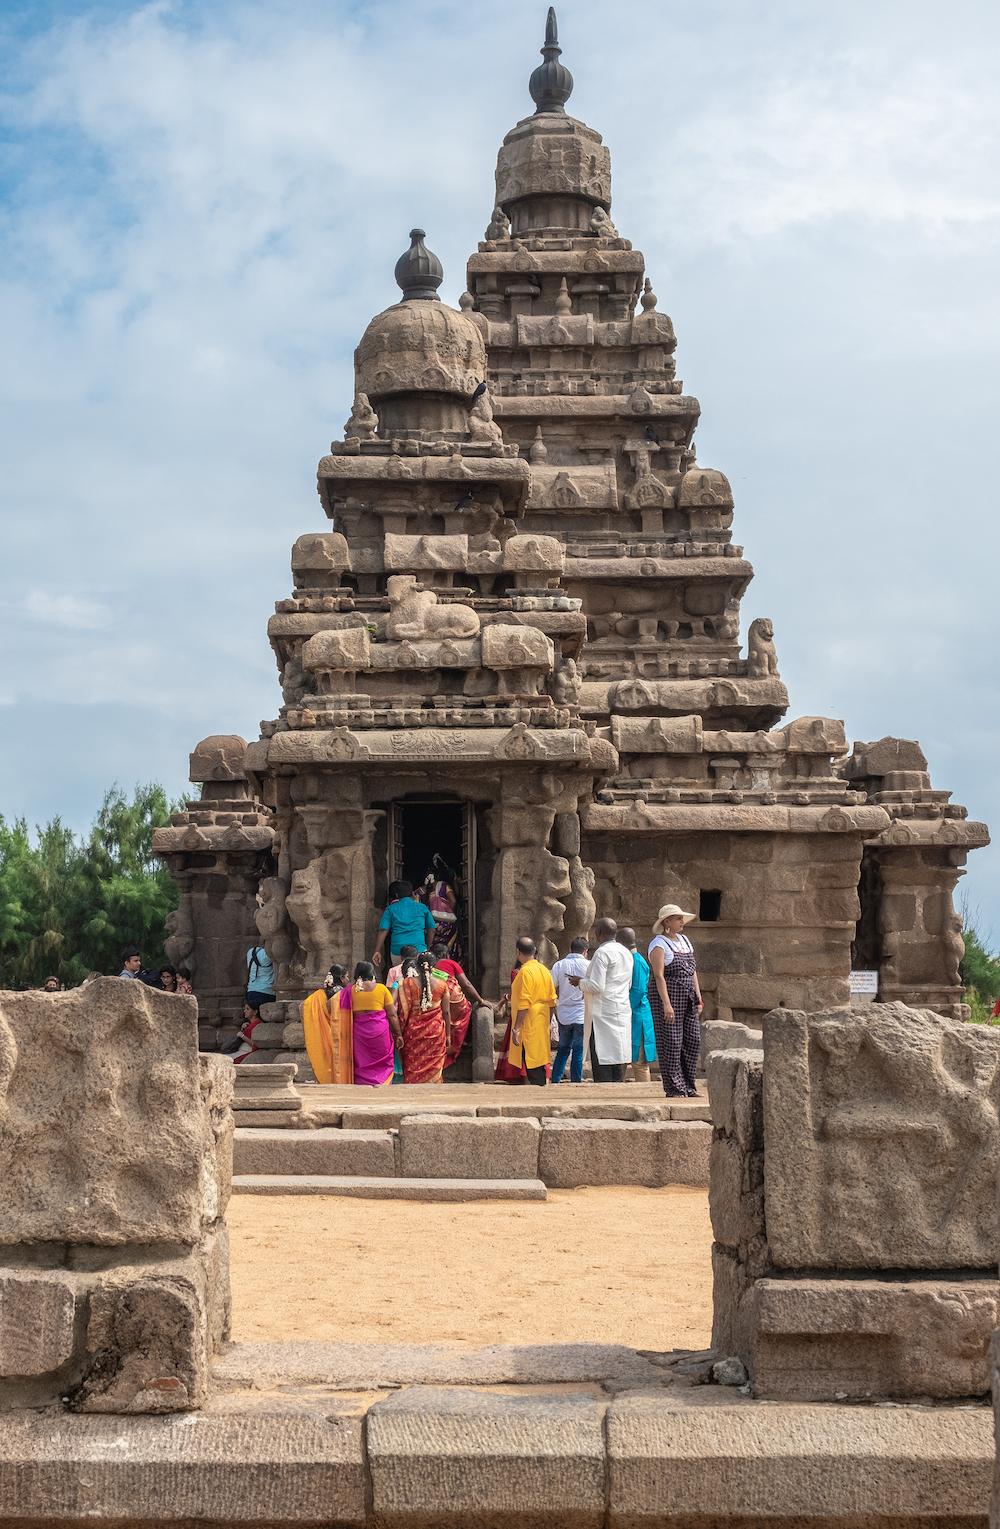 rondreis zuid india Mahabalipuram shore temple